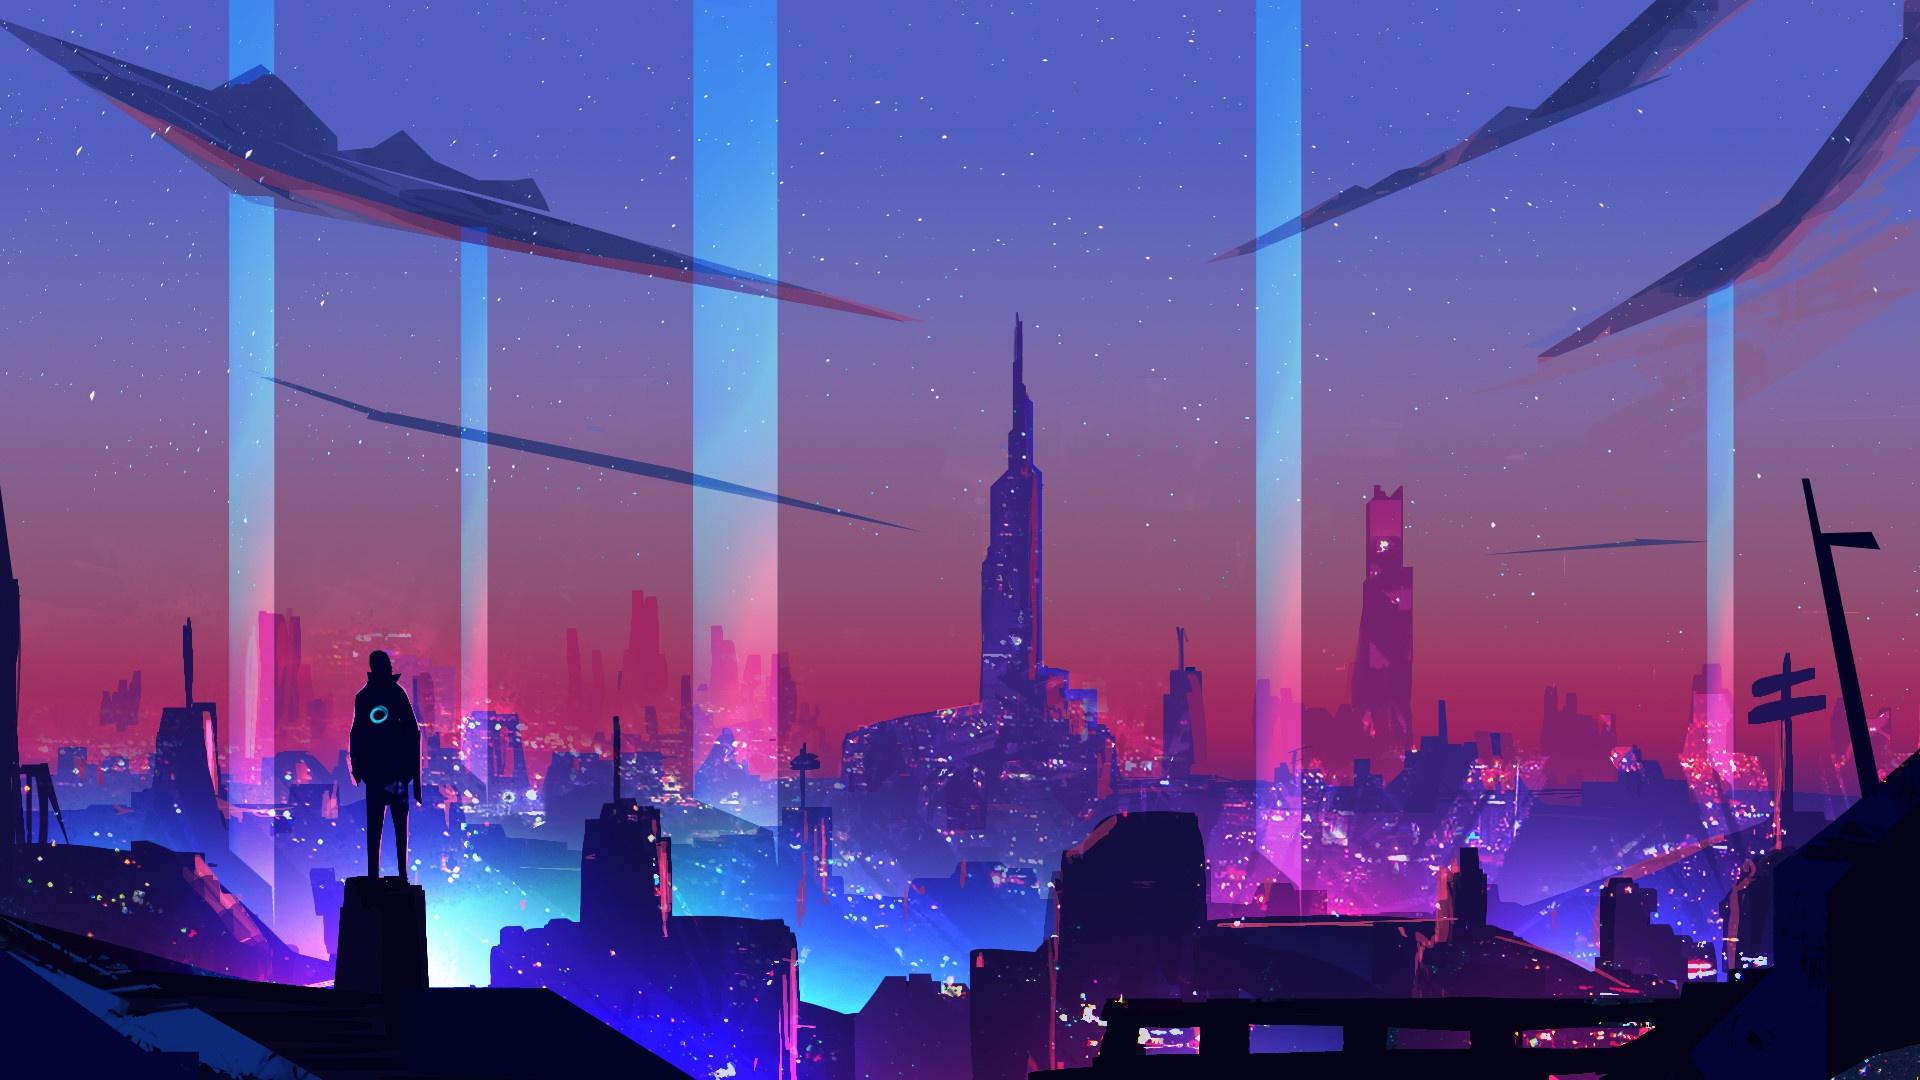 Wallpaper : Synth, Retrowave, neon, cyberpunk, digital art ...